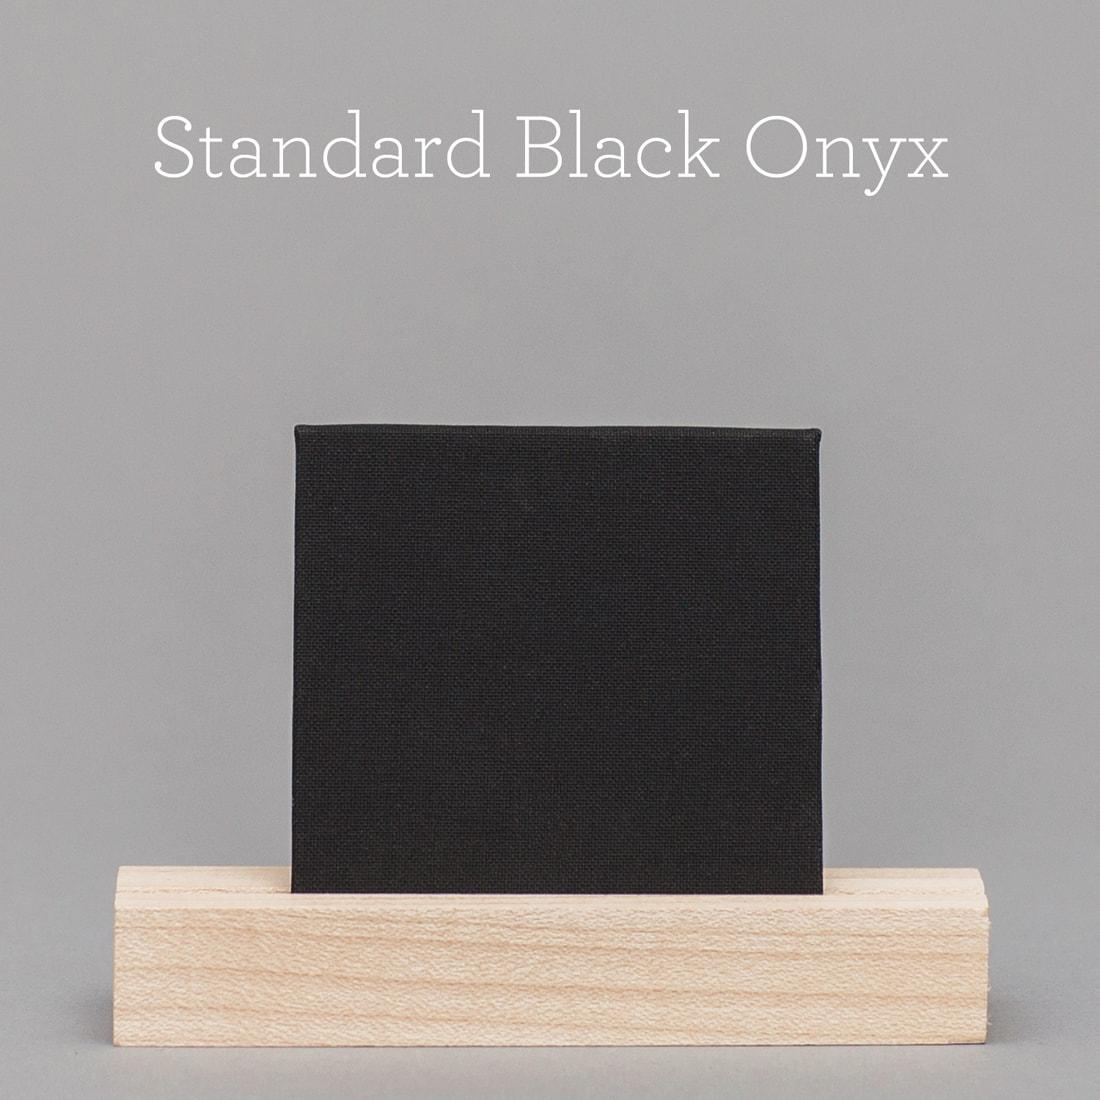 StandardBlackOnyx